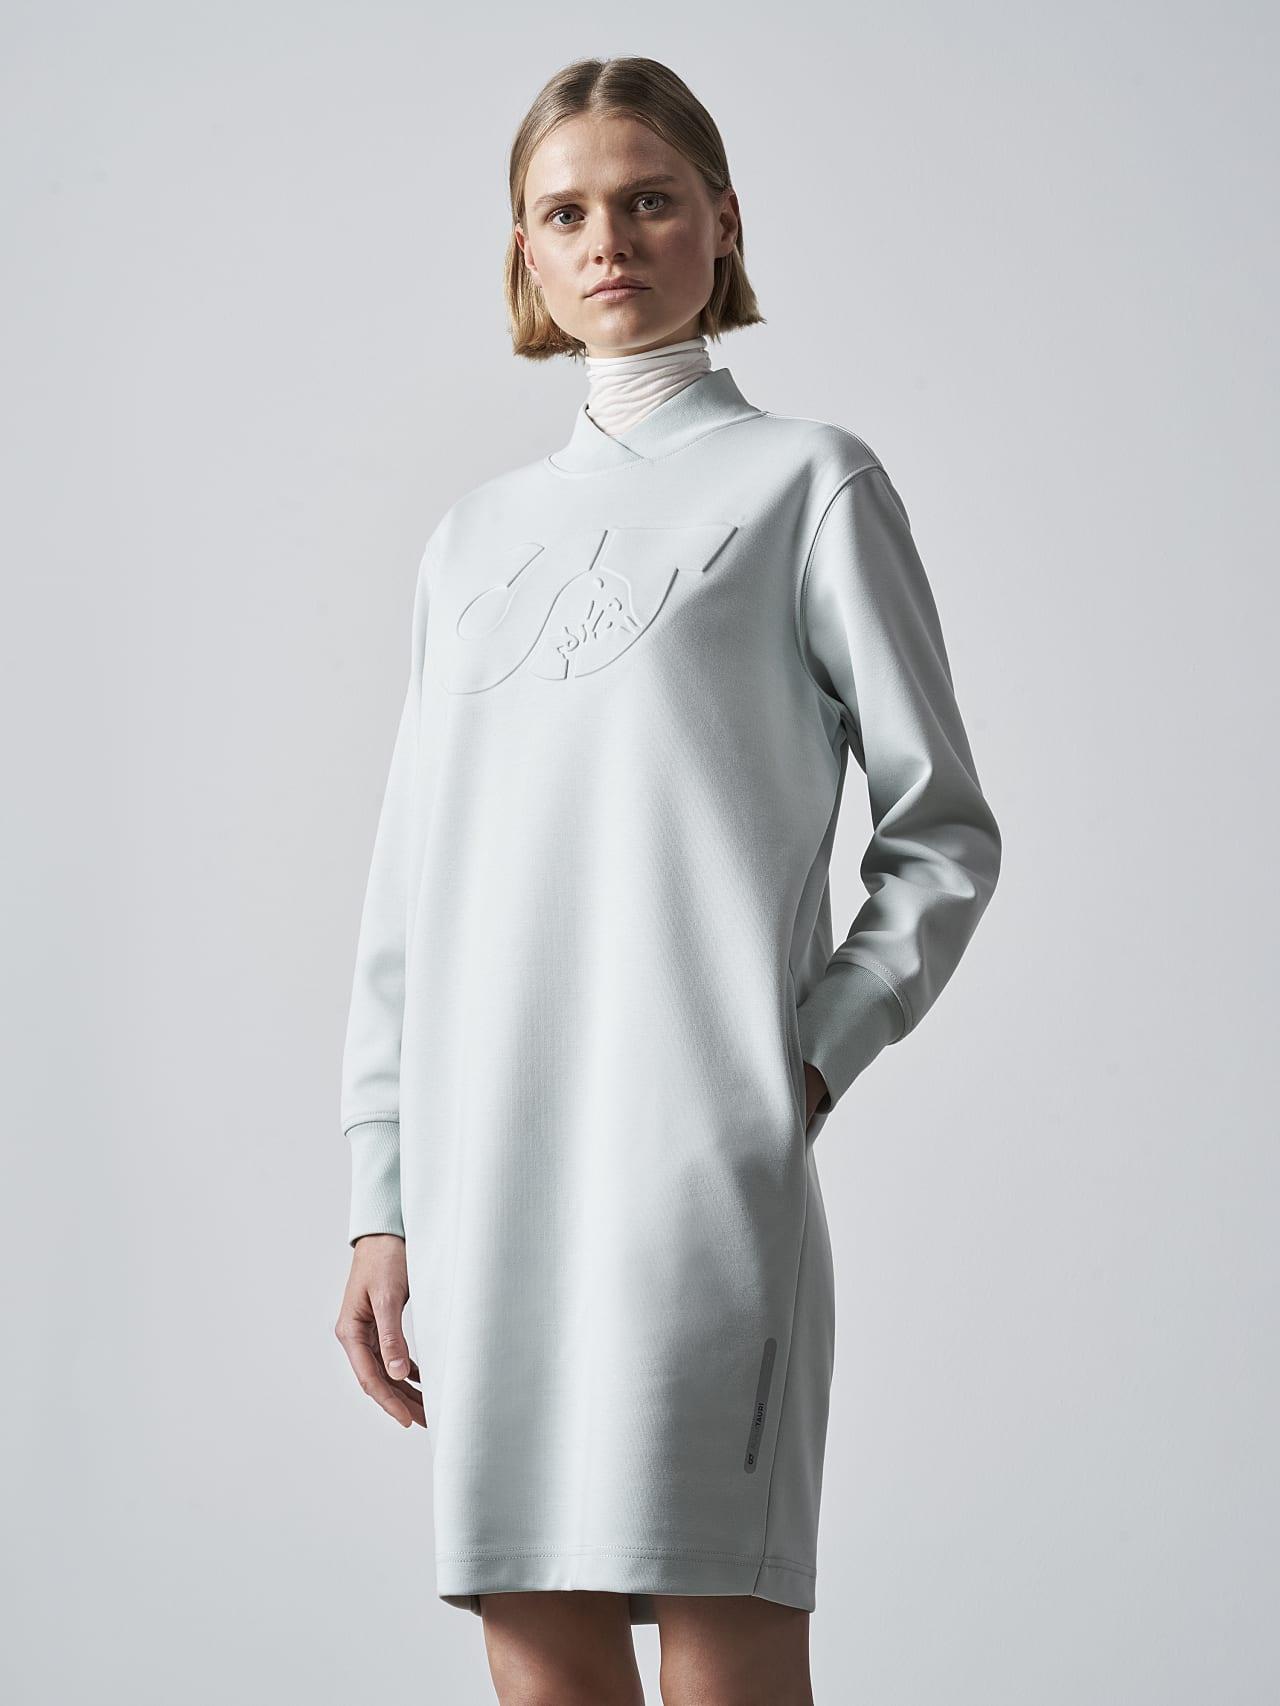 STAR V3.Y5.02 Premium Logo Sweater Dress Pale Blue  Extra Alpha Tauri